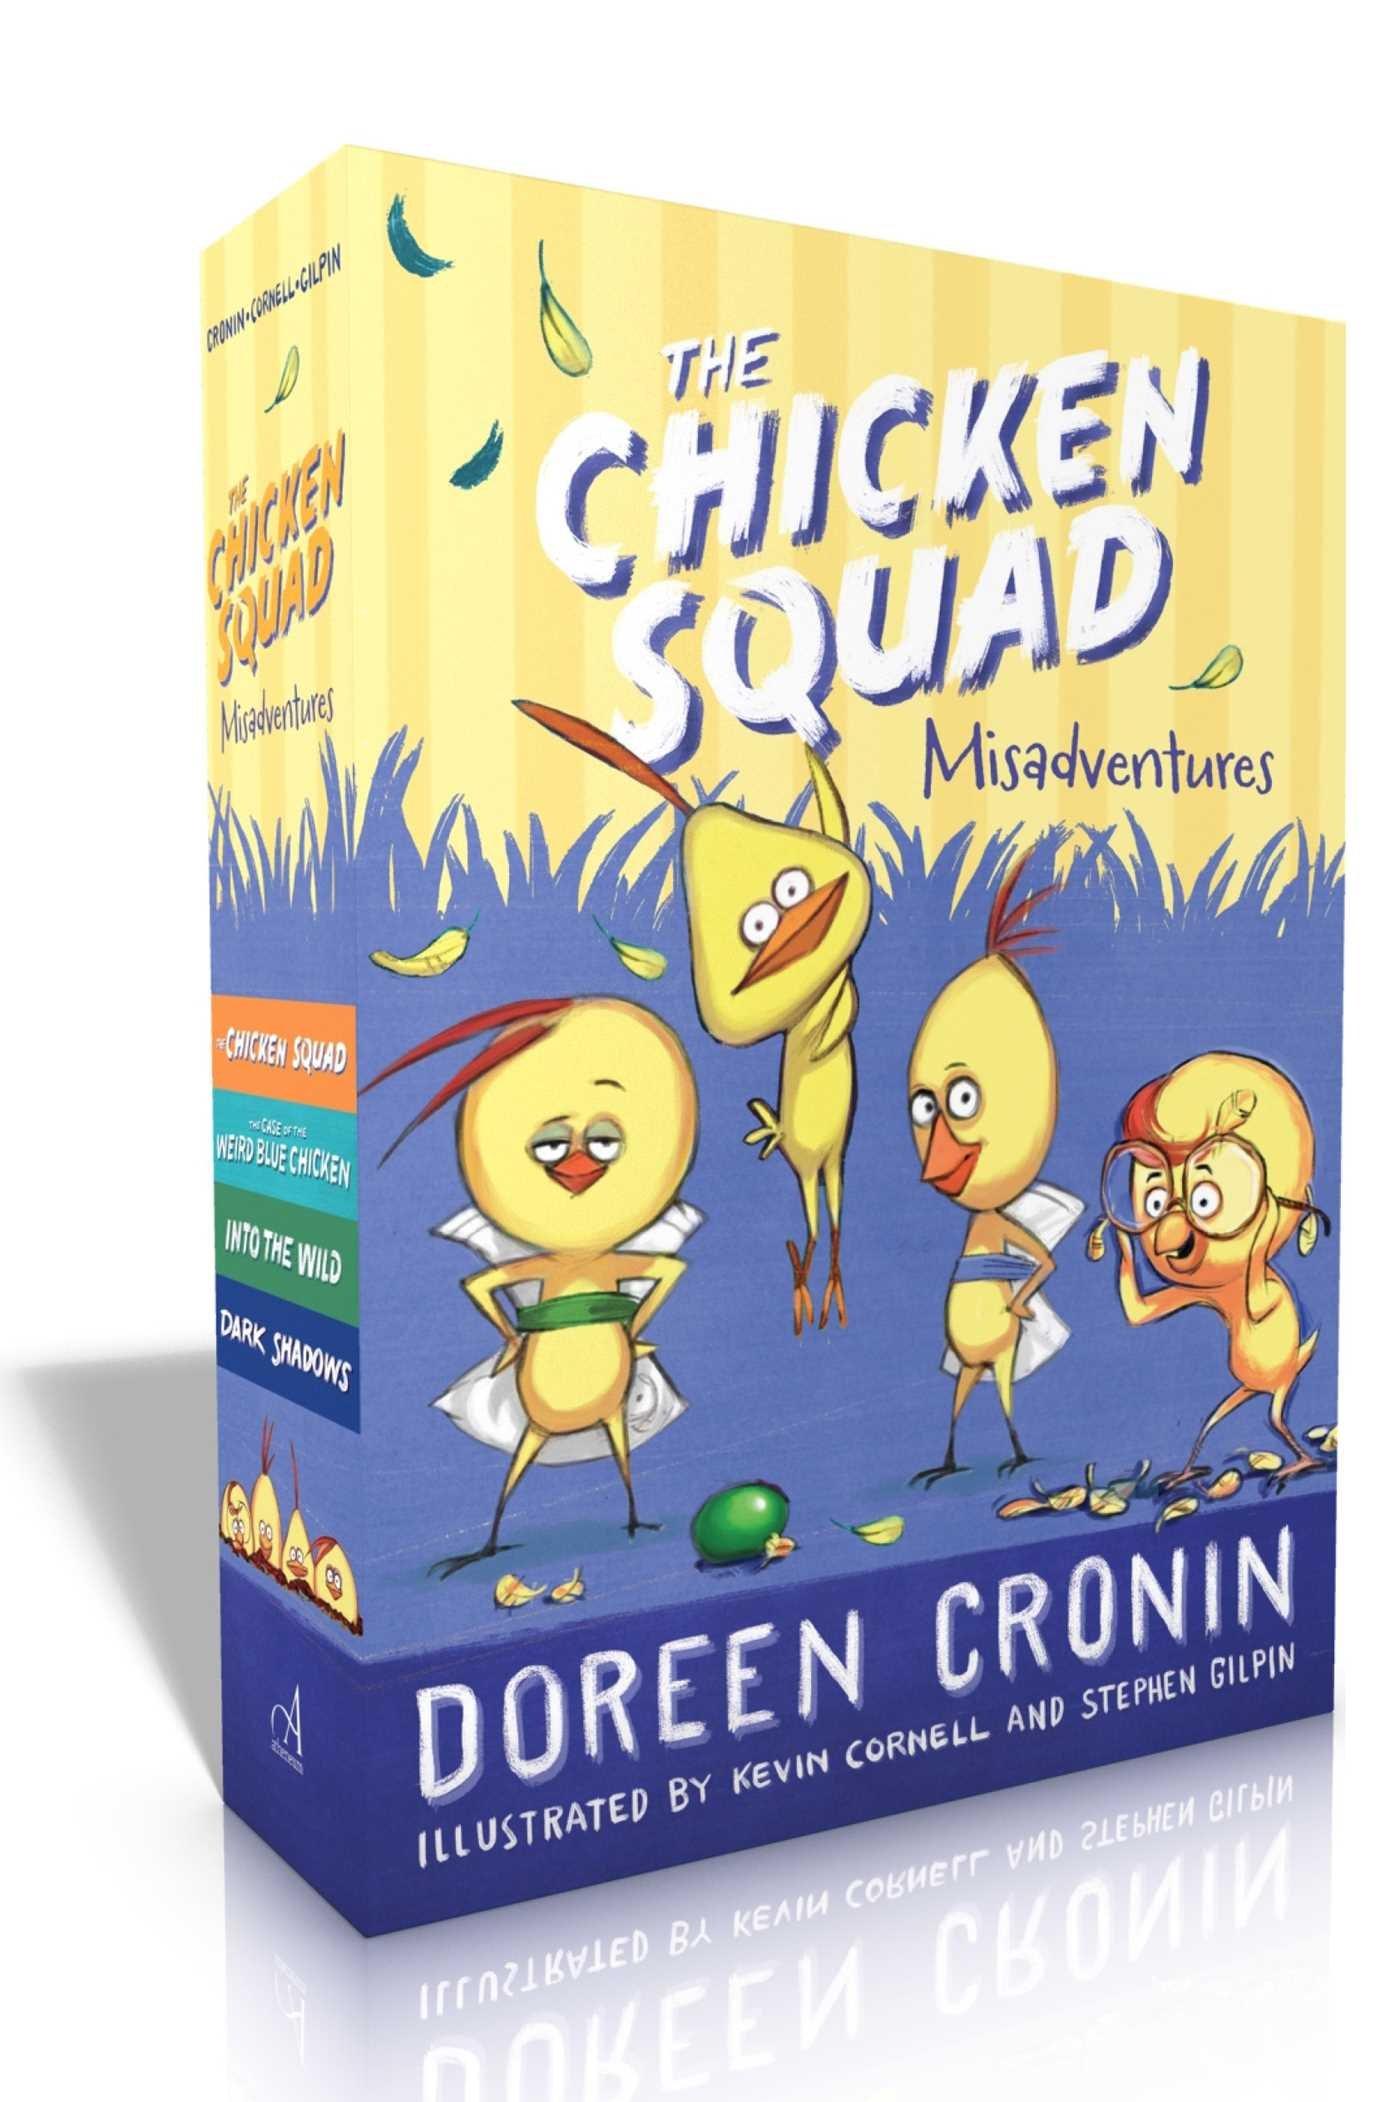 The Chicken Squad Misadventures: The Chicken Squad; The Case of the Weird Blue Chicken; Into the Wild; Dark Shadows